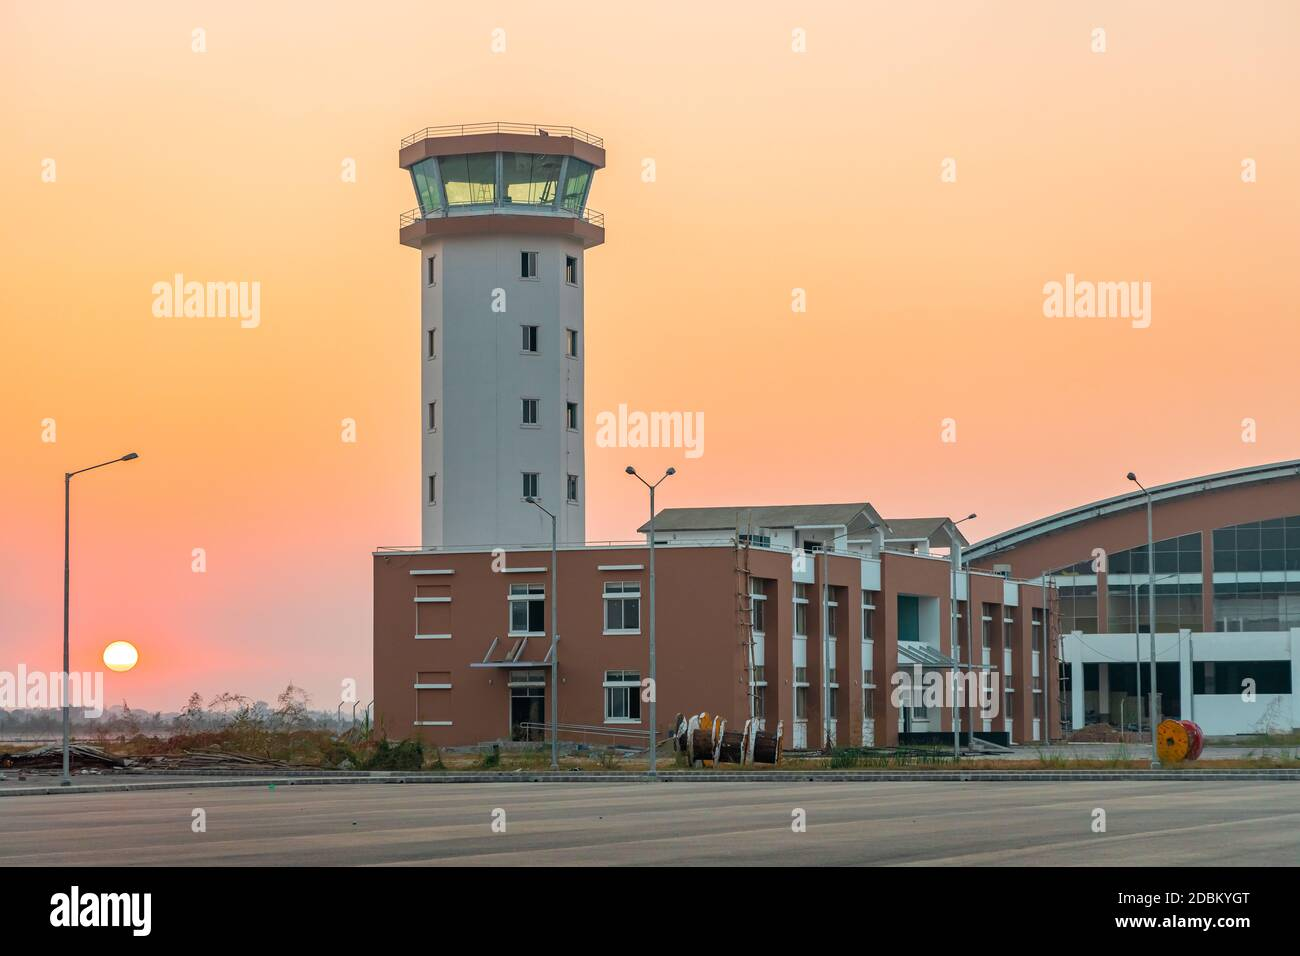 Aeropuerto Gautam Buddha en Bhairahawa, Nepal. Se espera que la terminal internacional funcione a partir de mediados de 2021. Foto de stock